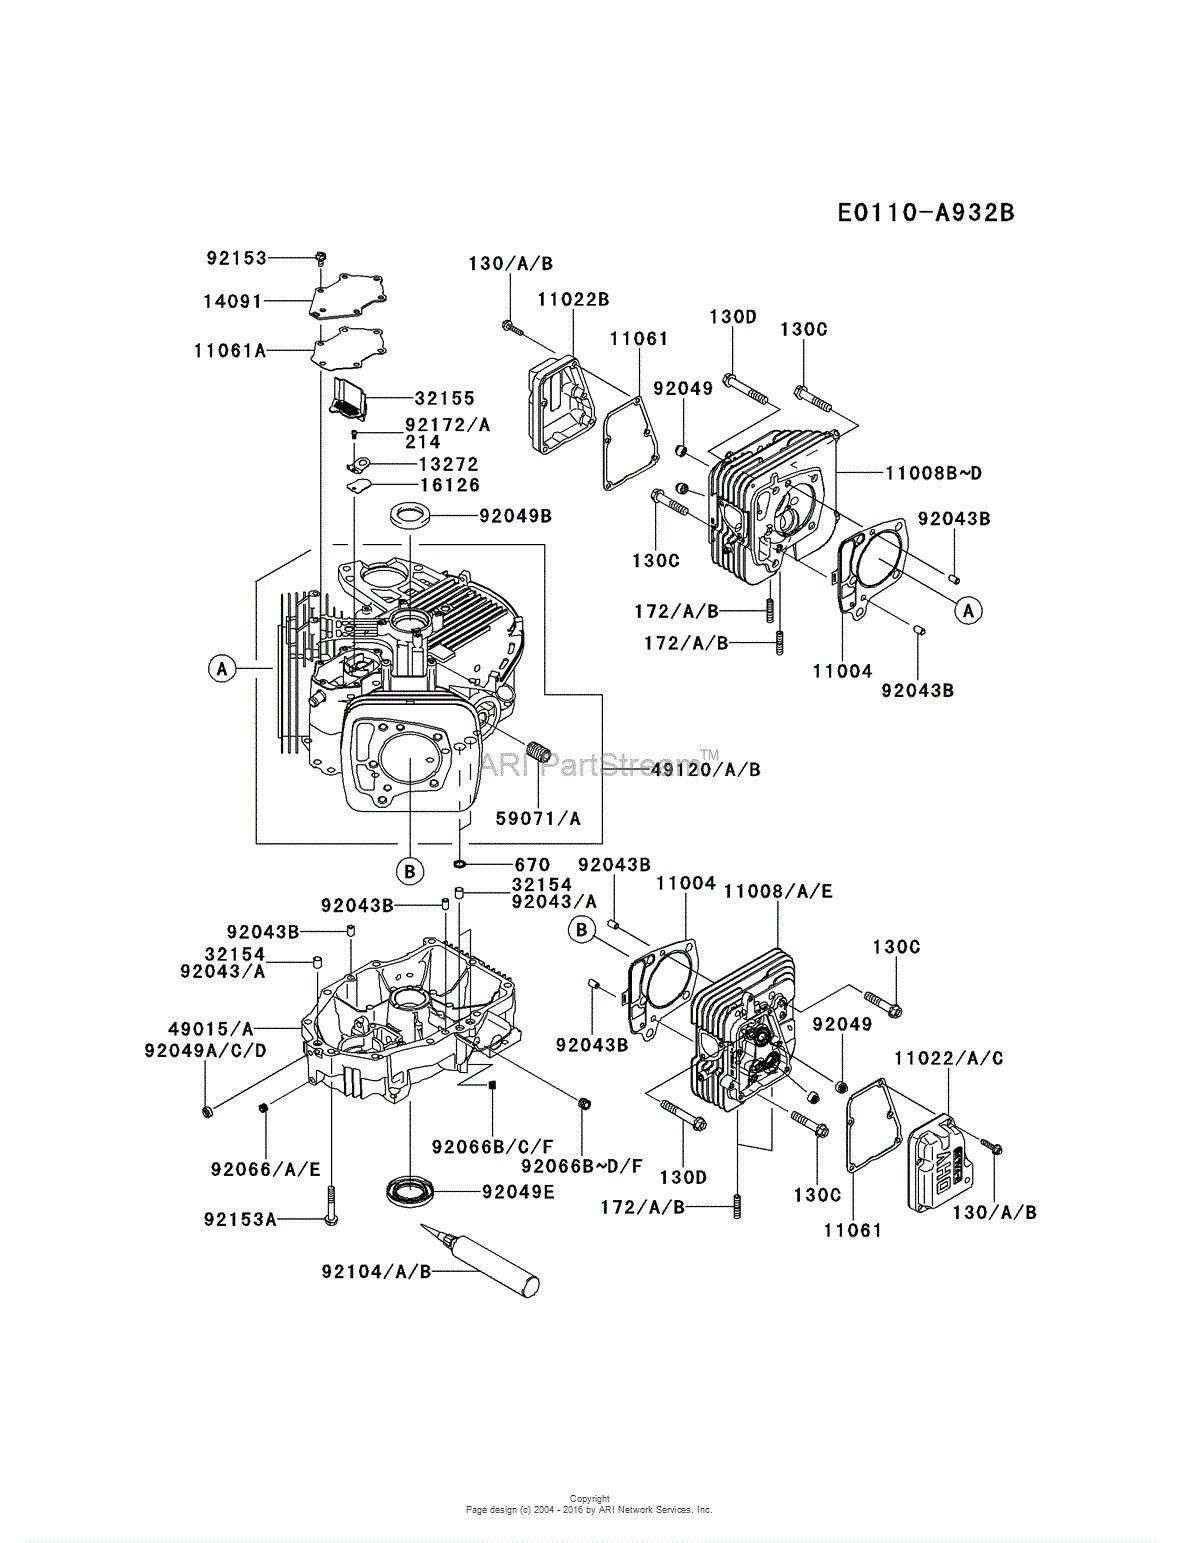 4stroke Engine Diagram Inspirational In 2020 6 Stroke Engine Kawasaki Cylinder